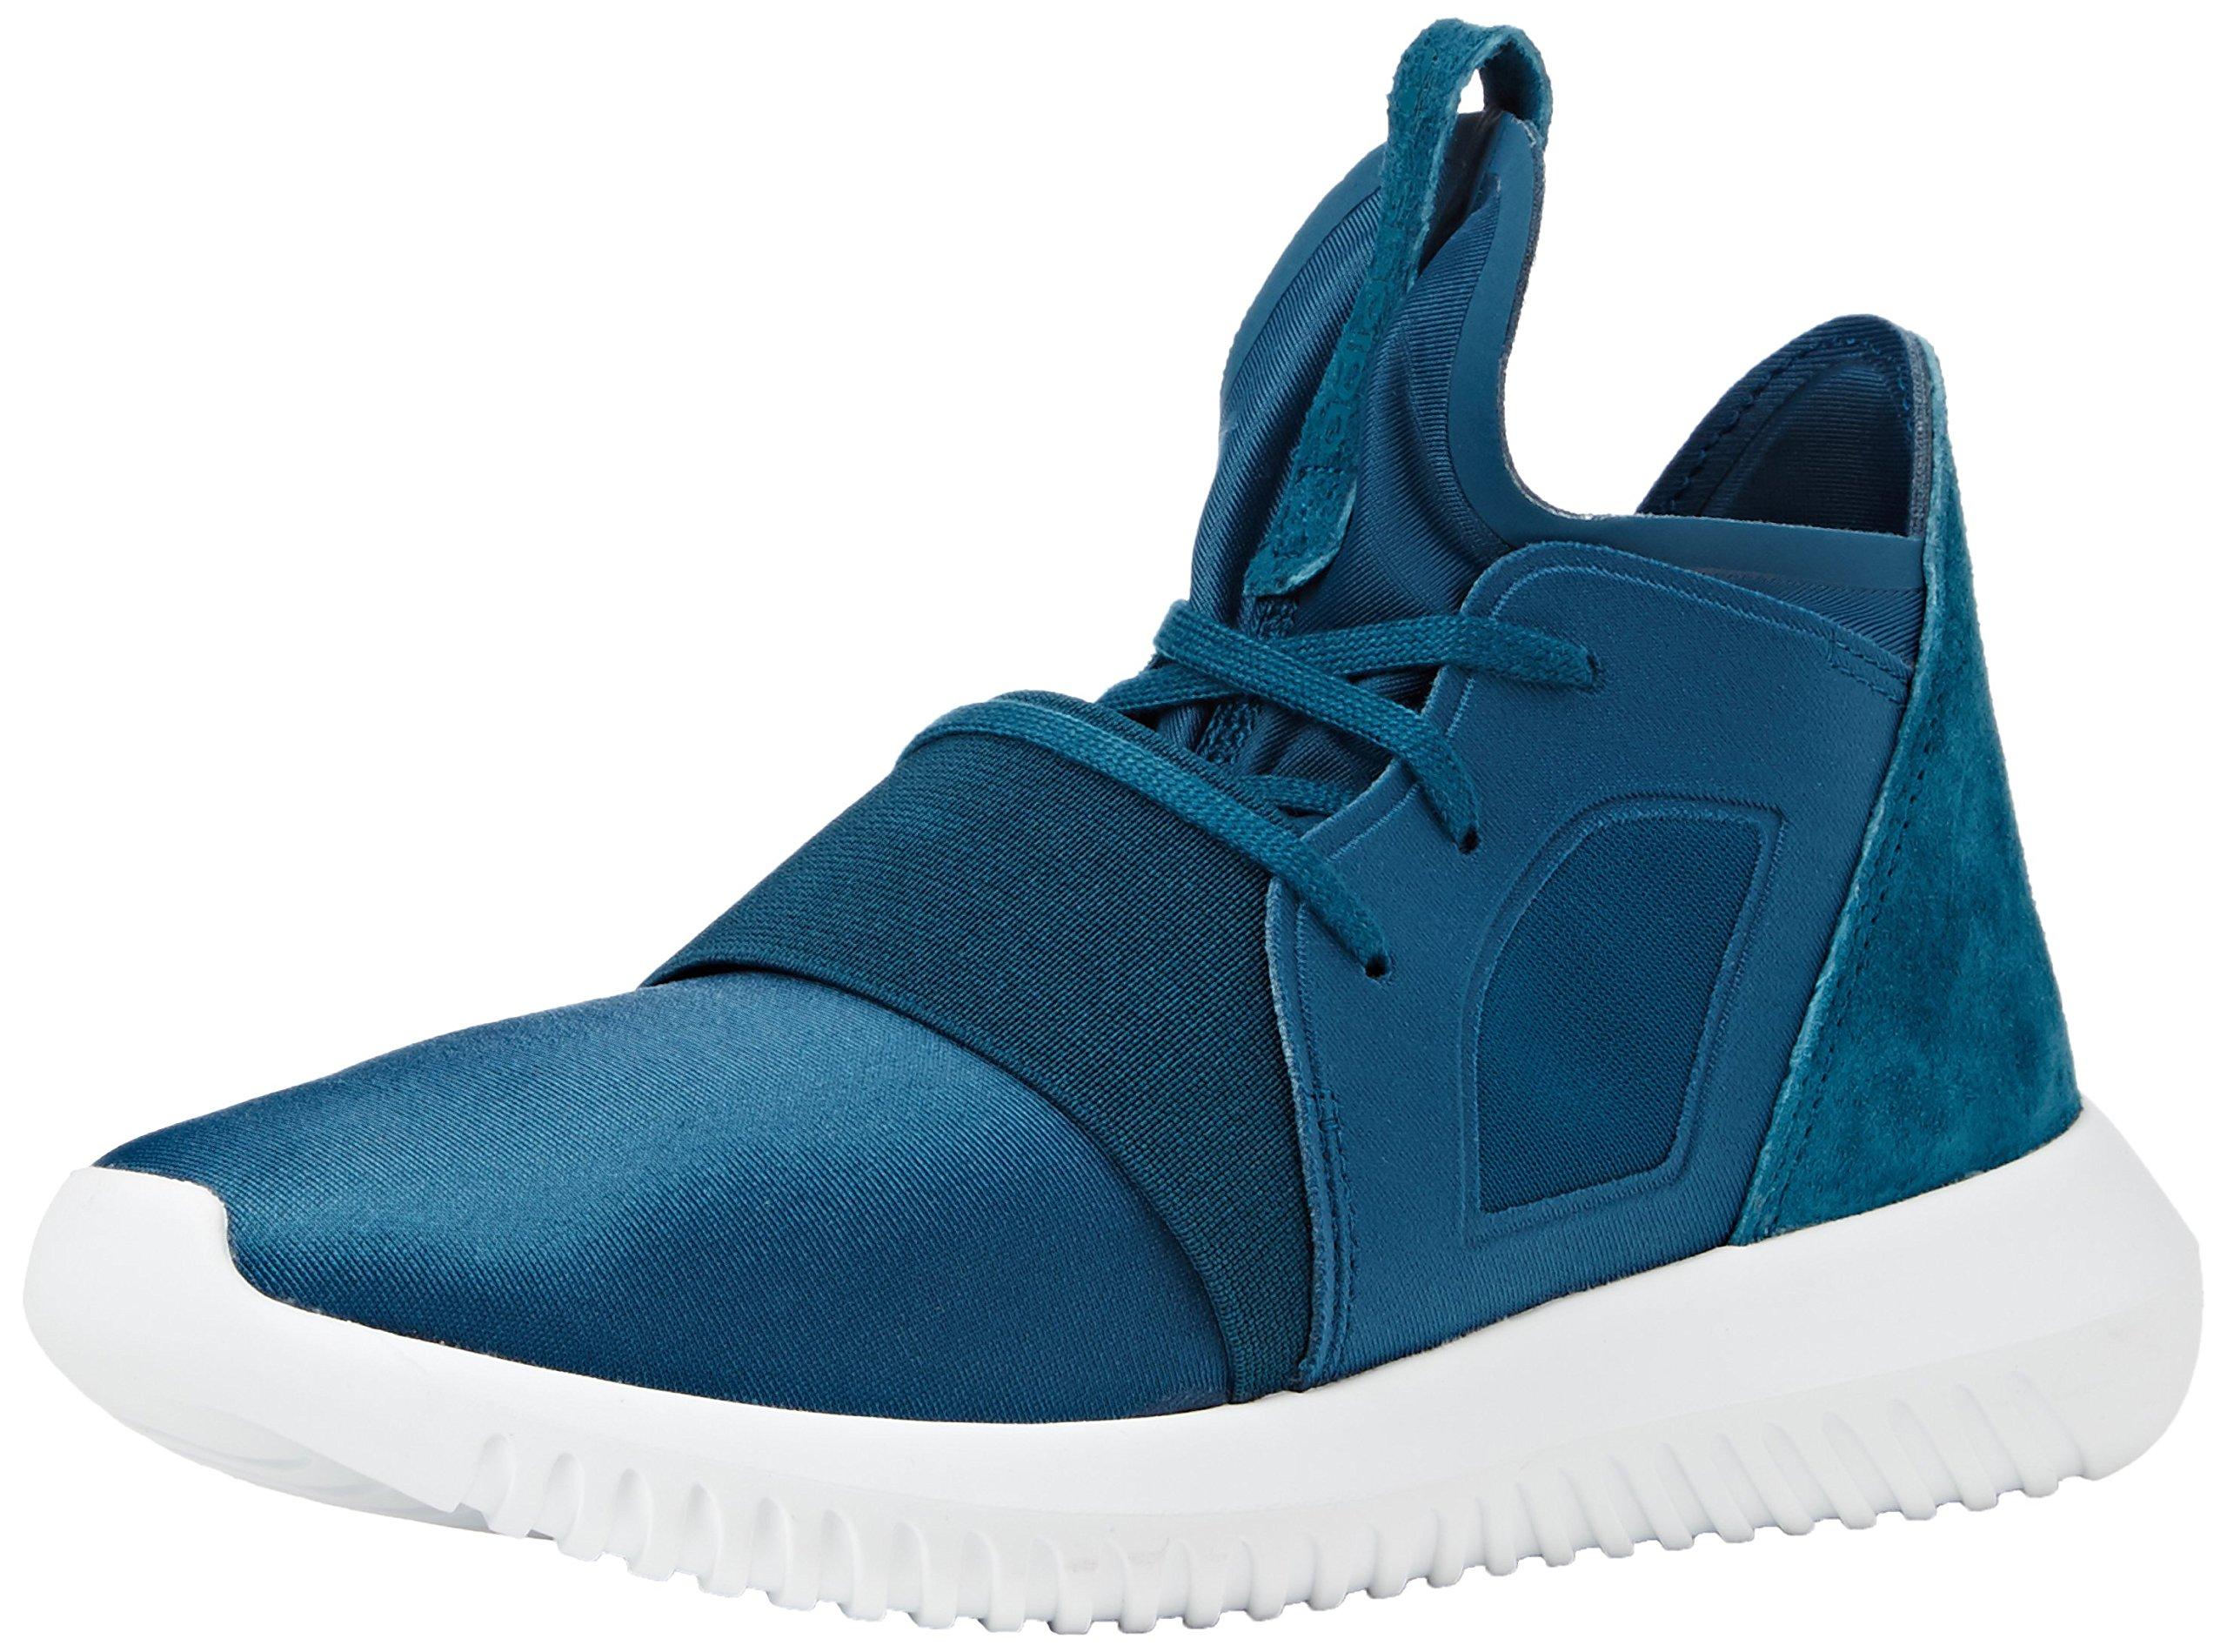 Hautes Adidas core DefiantSneakers Tubular Mineral White38 Eu FemmeTurquoise bY7gyfvI6